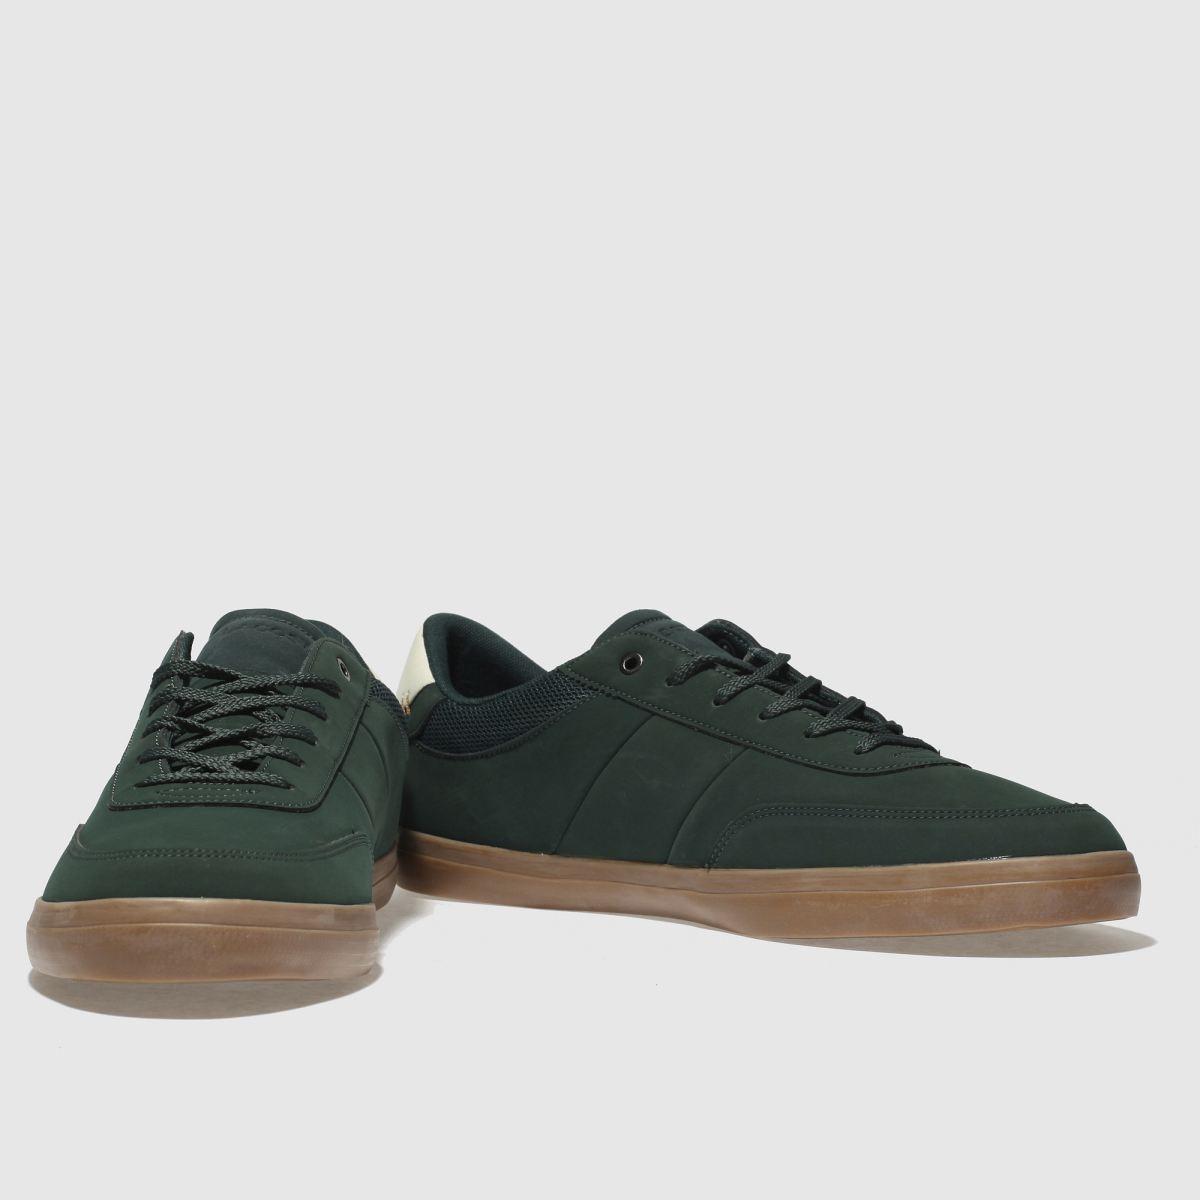 Herren Grün lacoste Gute Court-master Sneaker | schuh Gute lacoste Qualität beliebte Schuhe 6b1a0b